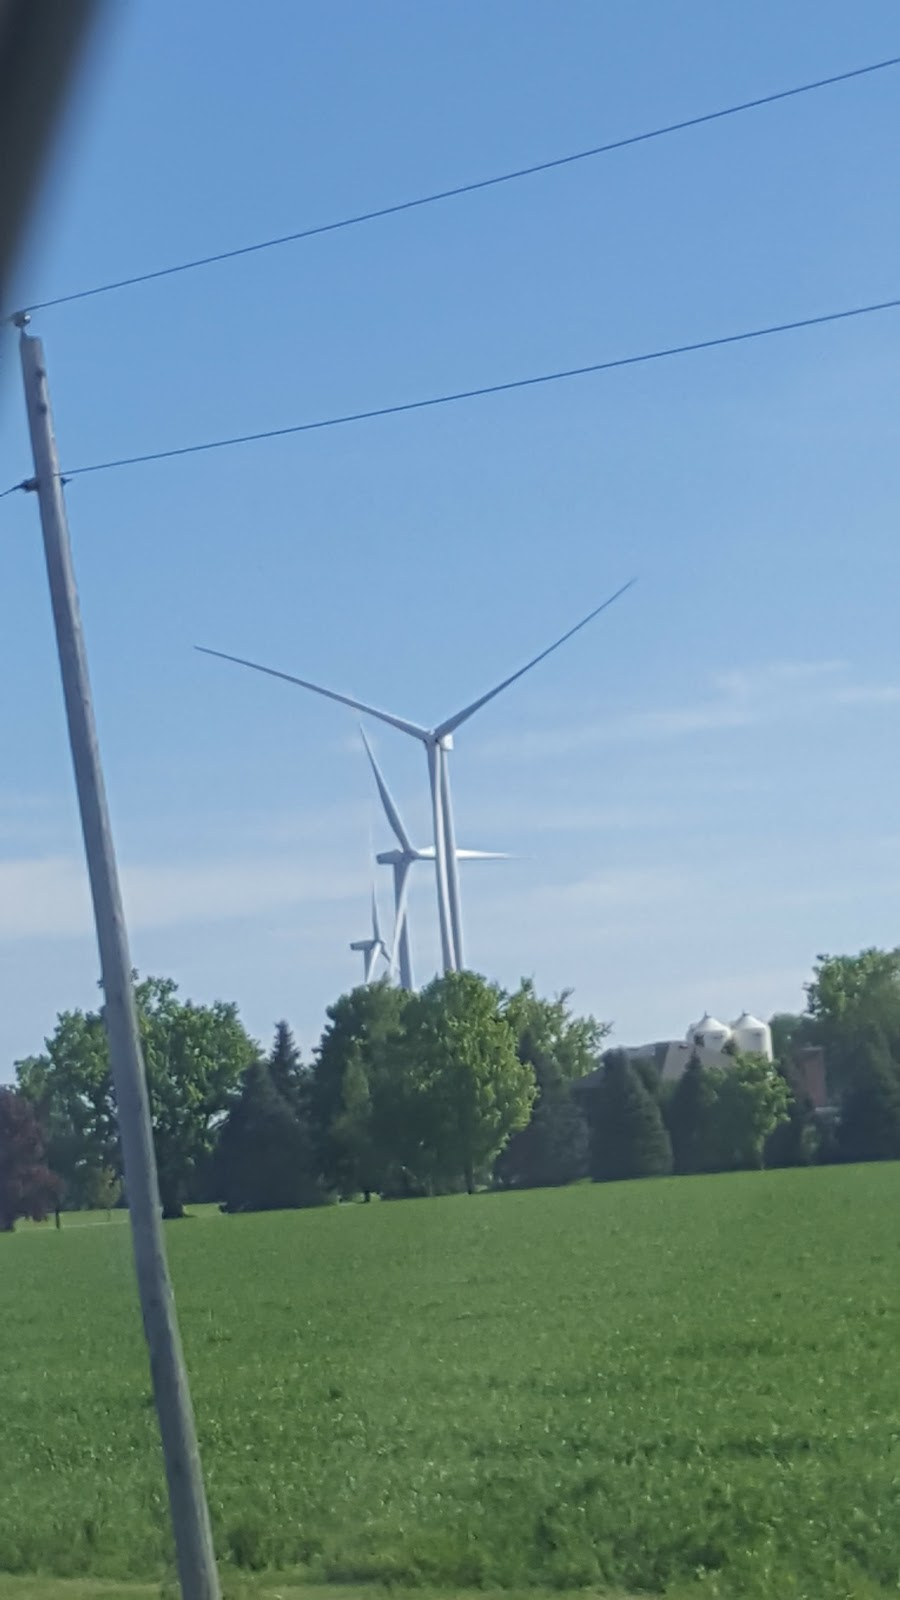 D&C Vander Zaag Farms Ltd. | point of interest | 518086 Dufferin County Rd 124, Melancthon, ON L9V 1V9, Canada | 5199256812 OR +1 519-925-6812